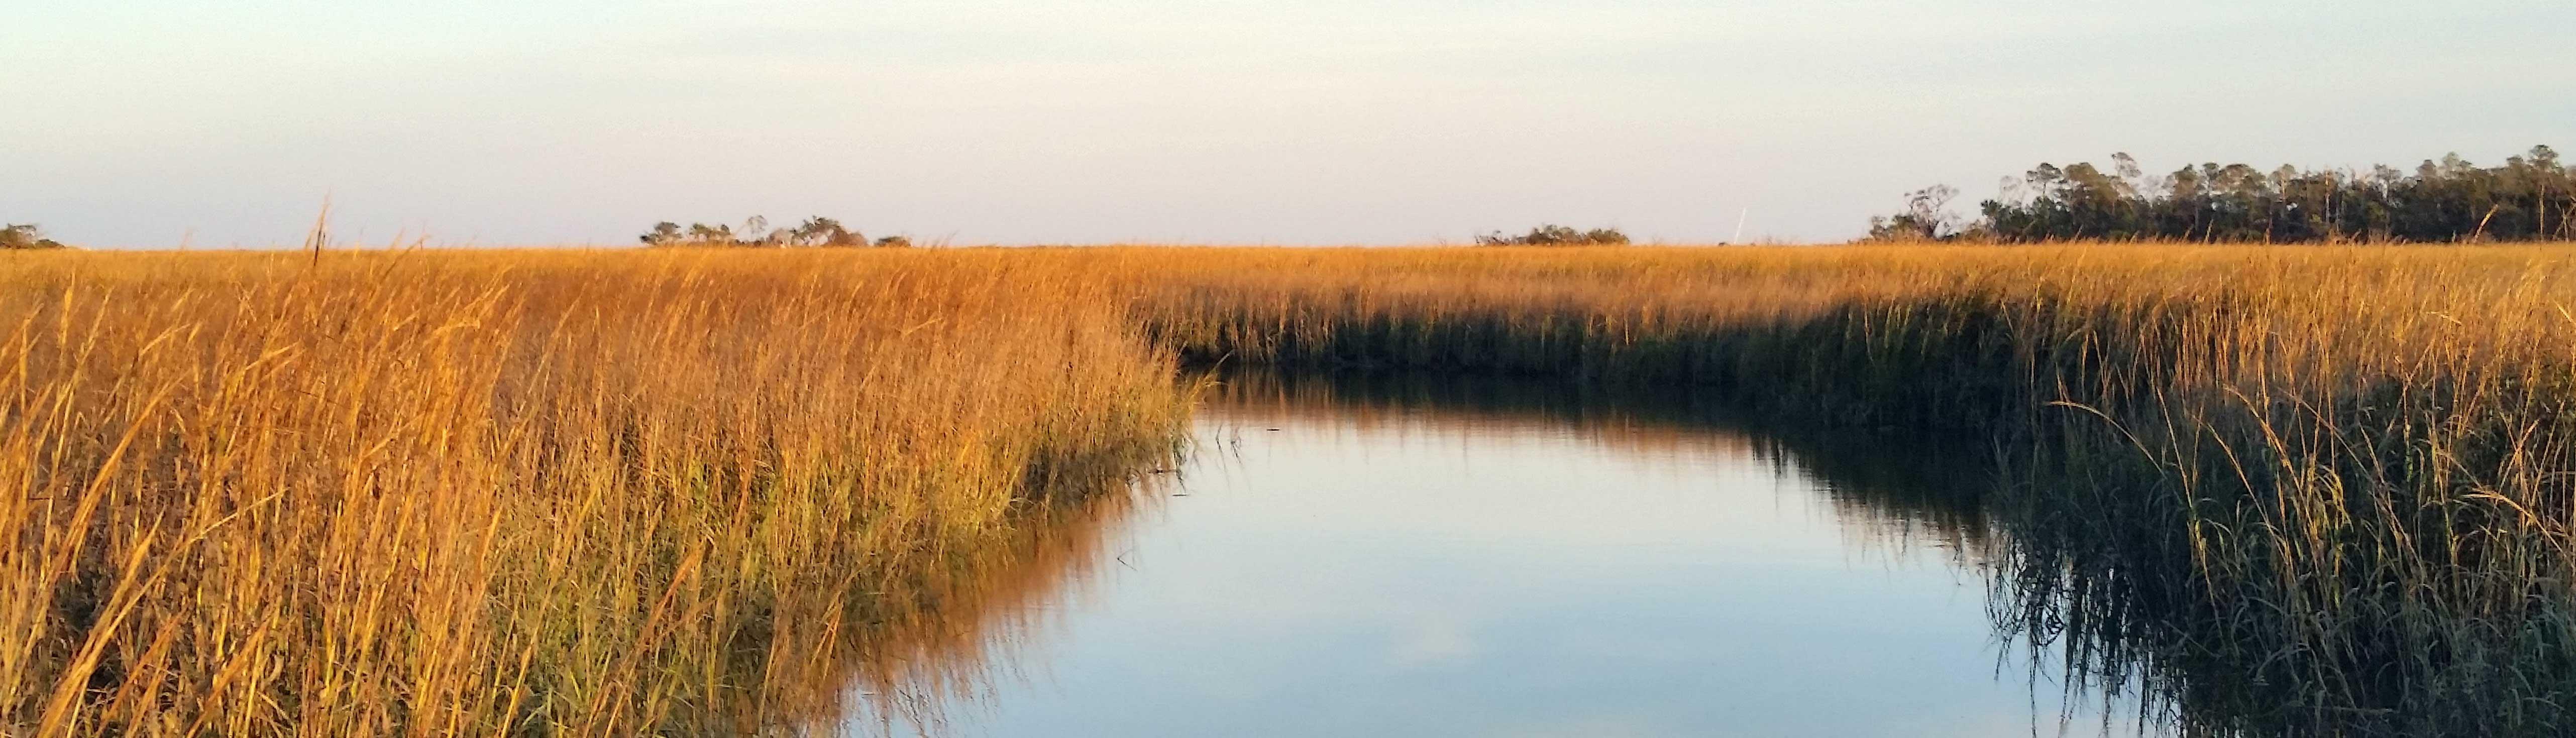 Tybee Island Marsh Grass